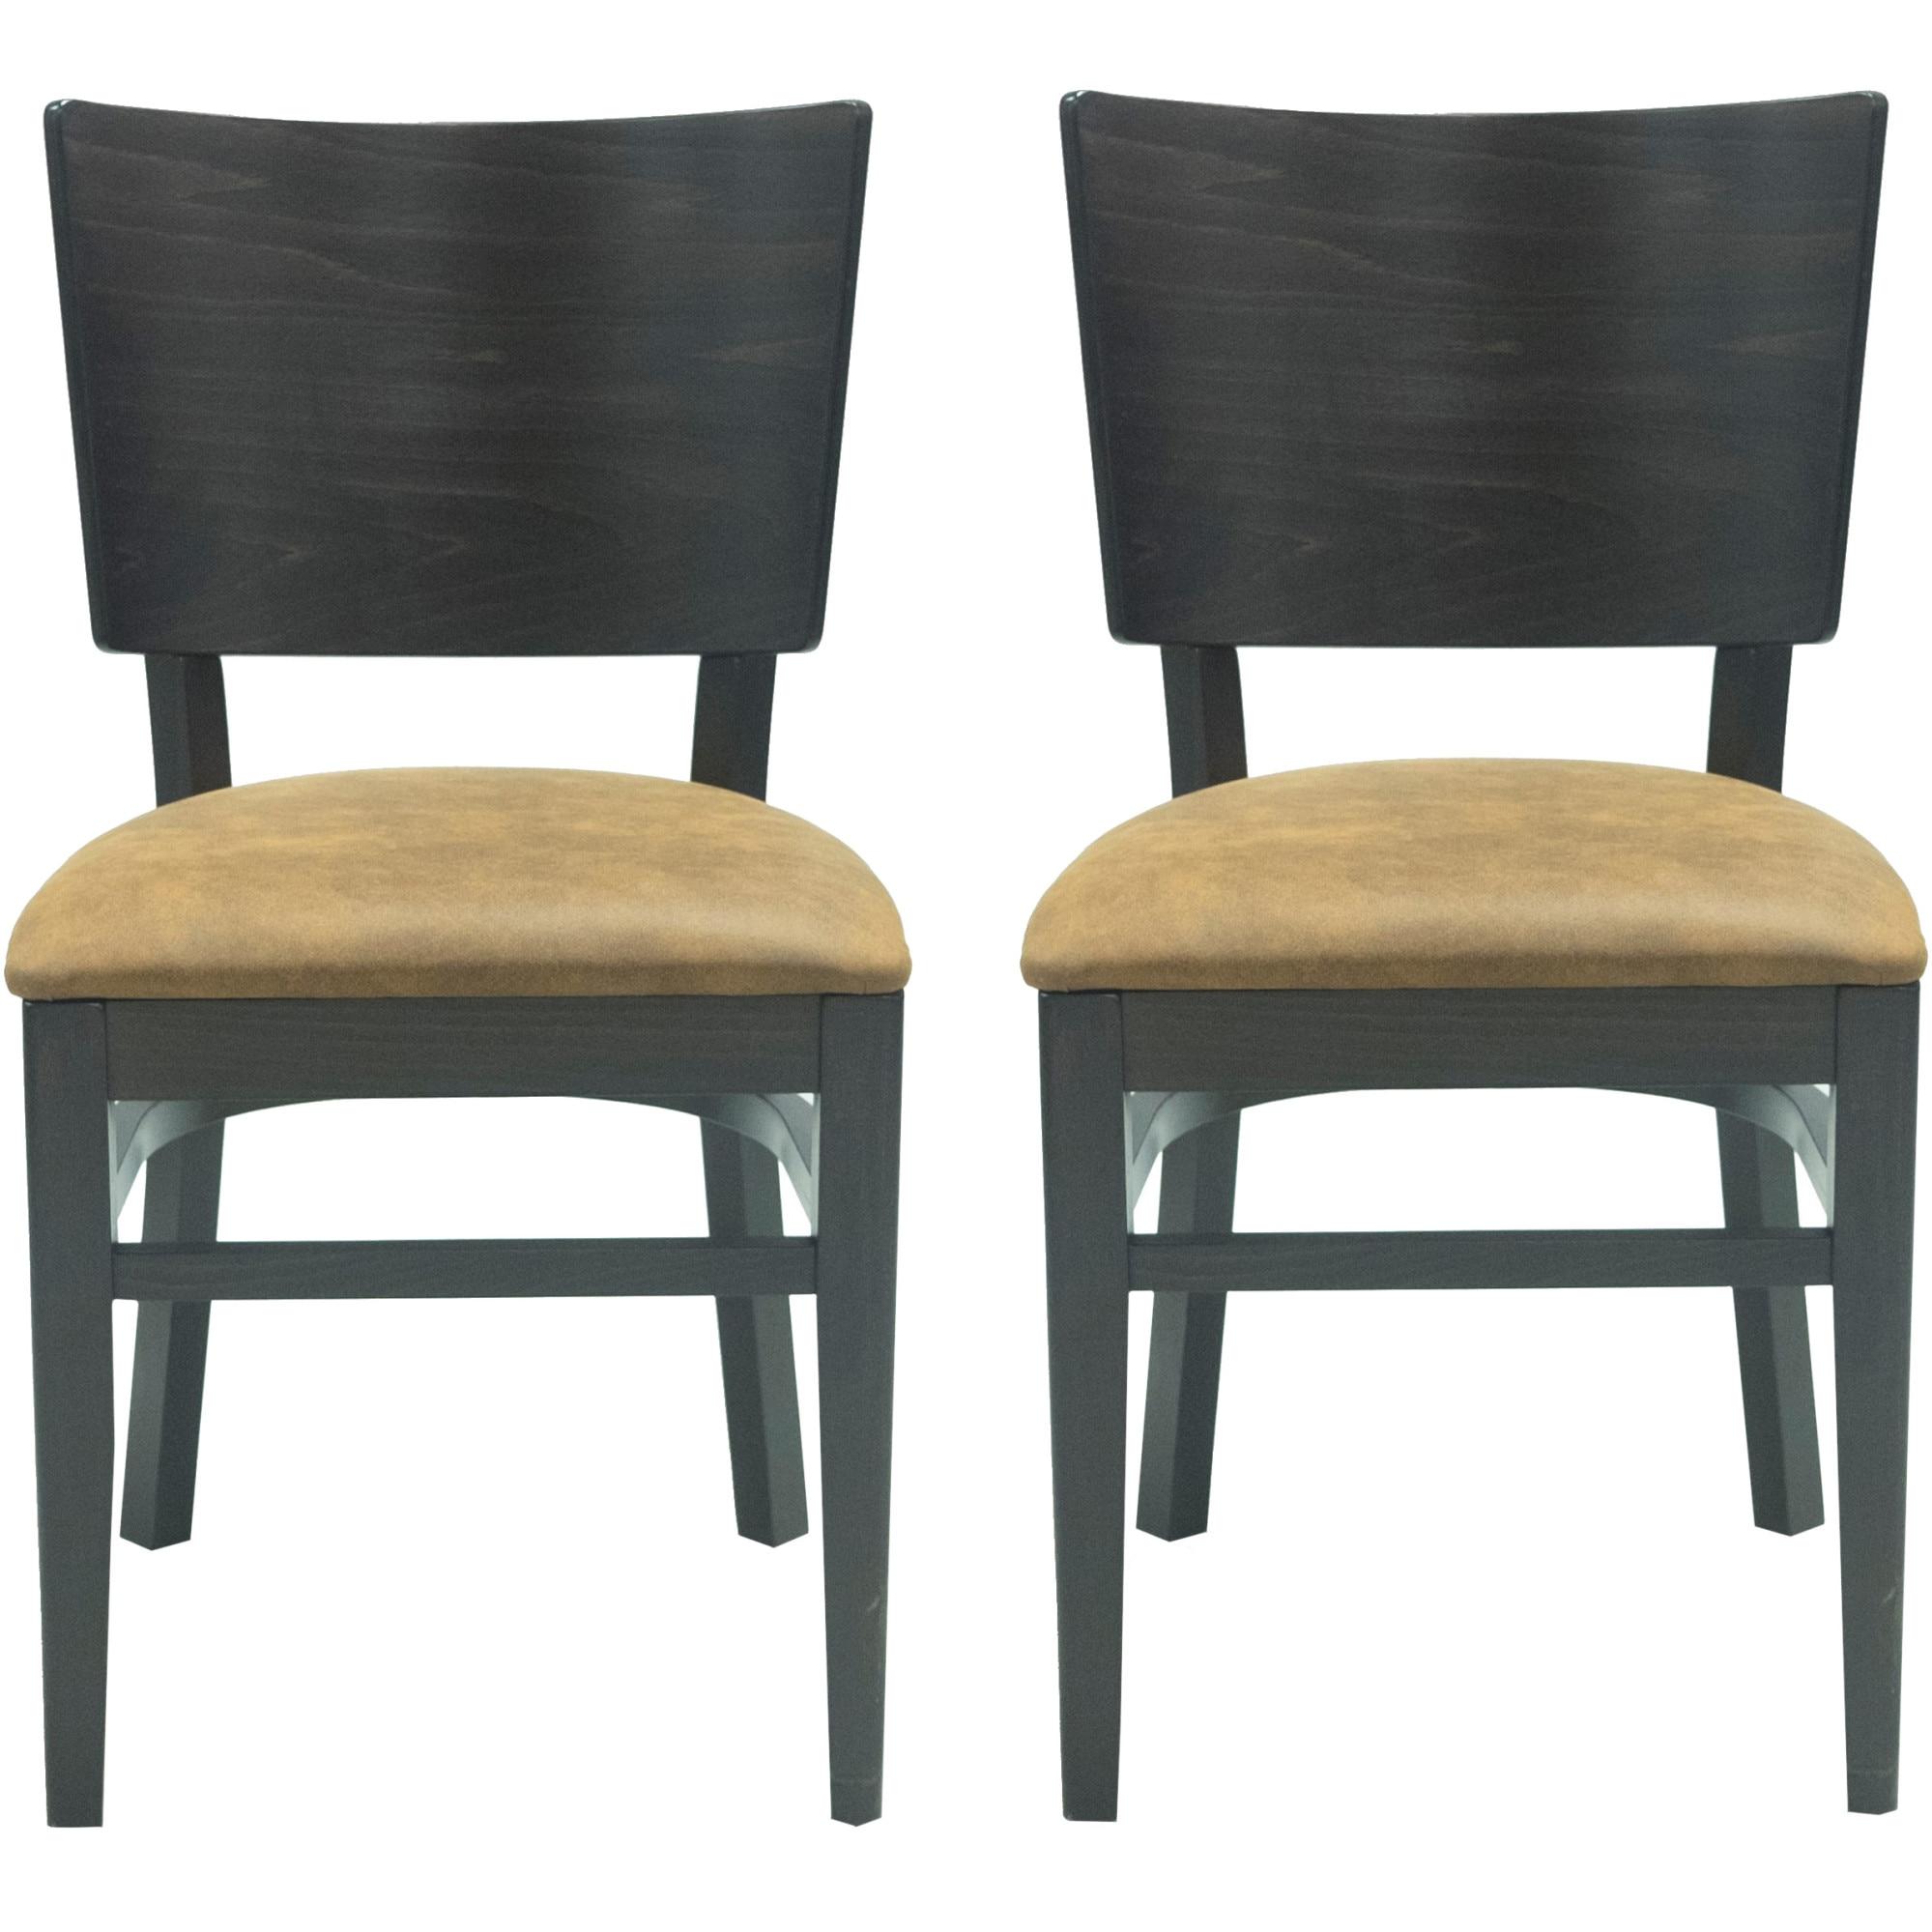 Fotografie Set 2 scaune Kasto Tobias, lemn esenta tare, culoare Wenge Dark